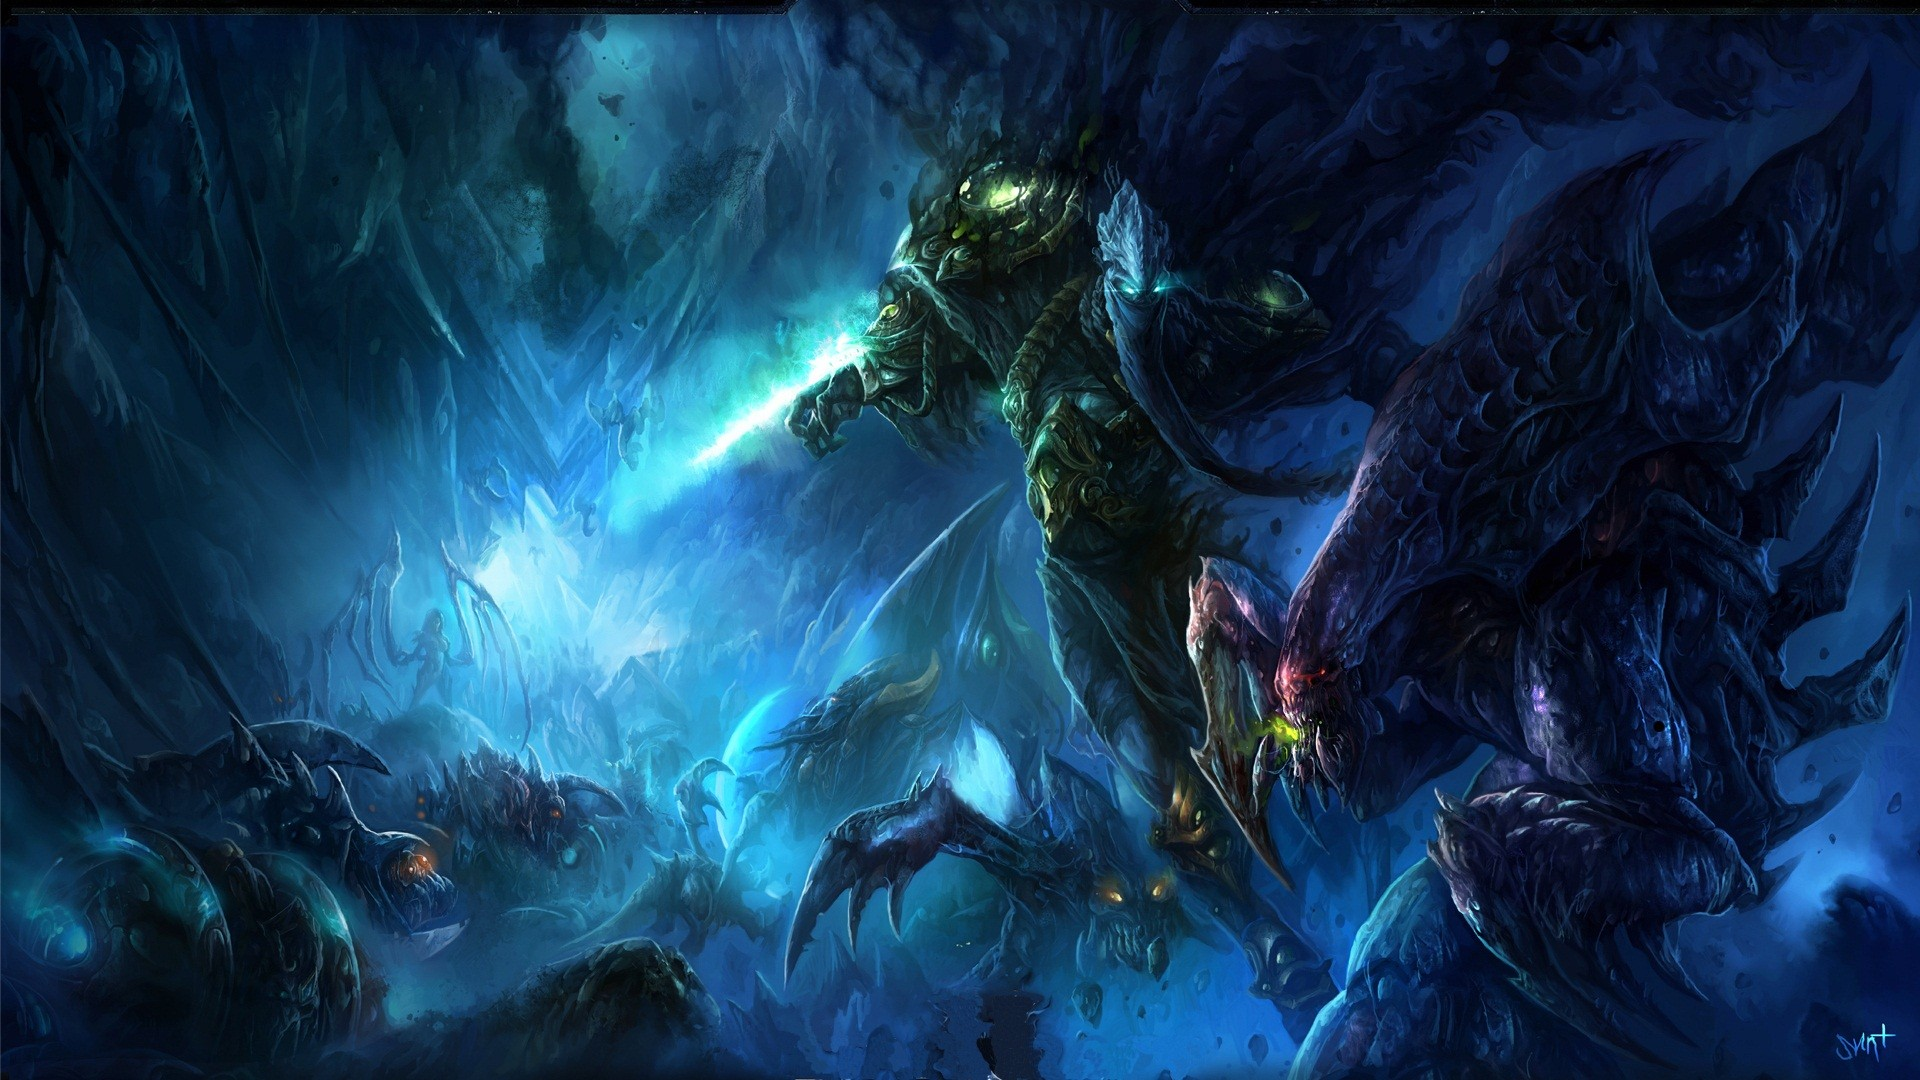 download Download Wallpaper Zerg vs Protoss Starcraft 2 1920x1080